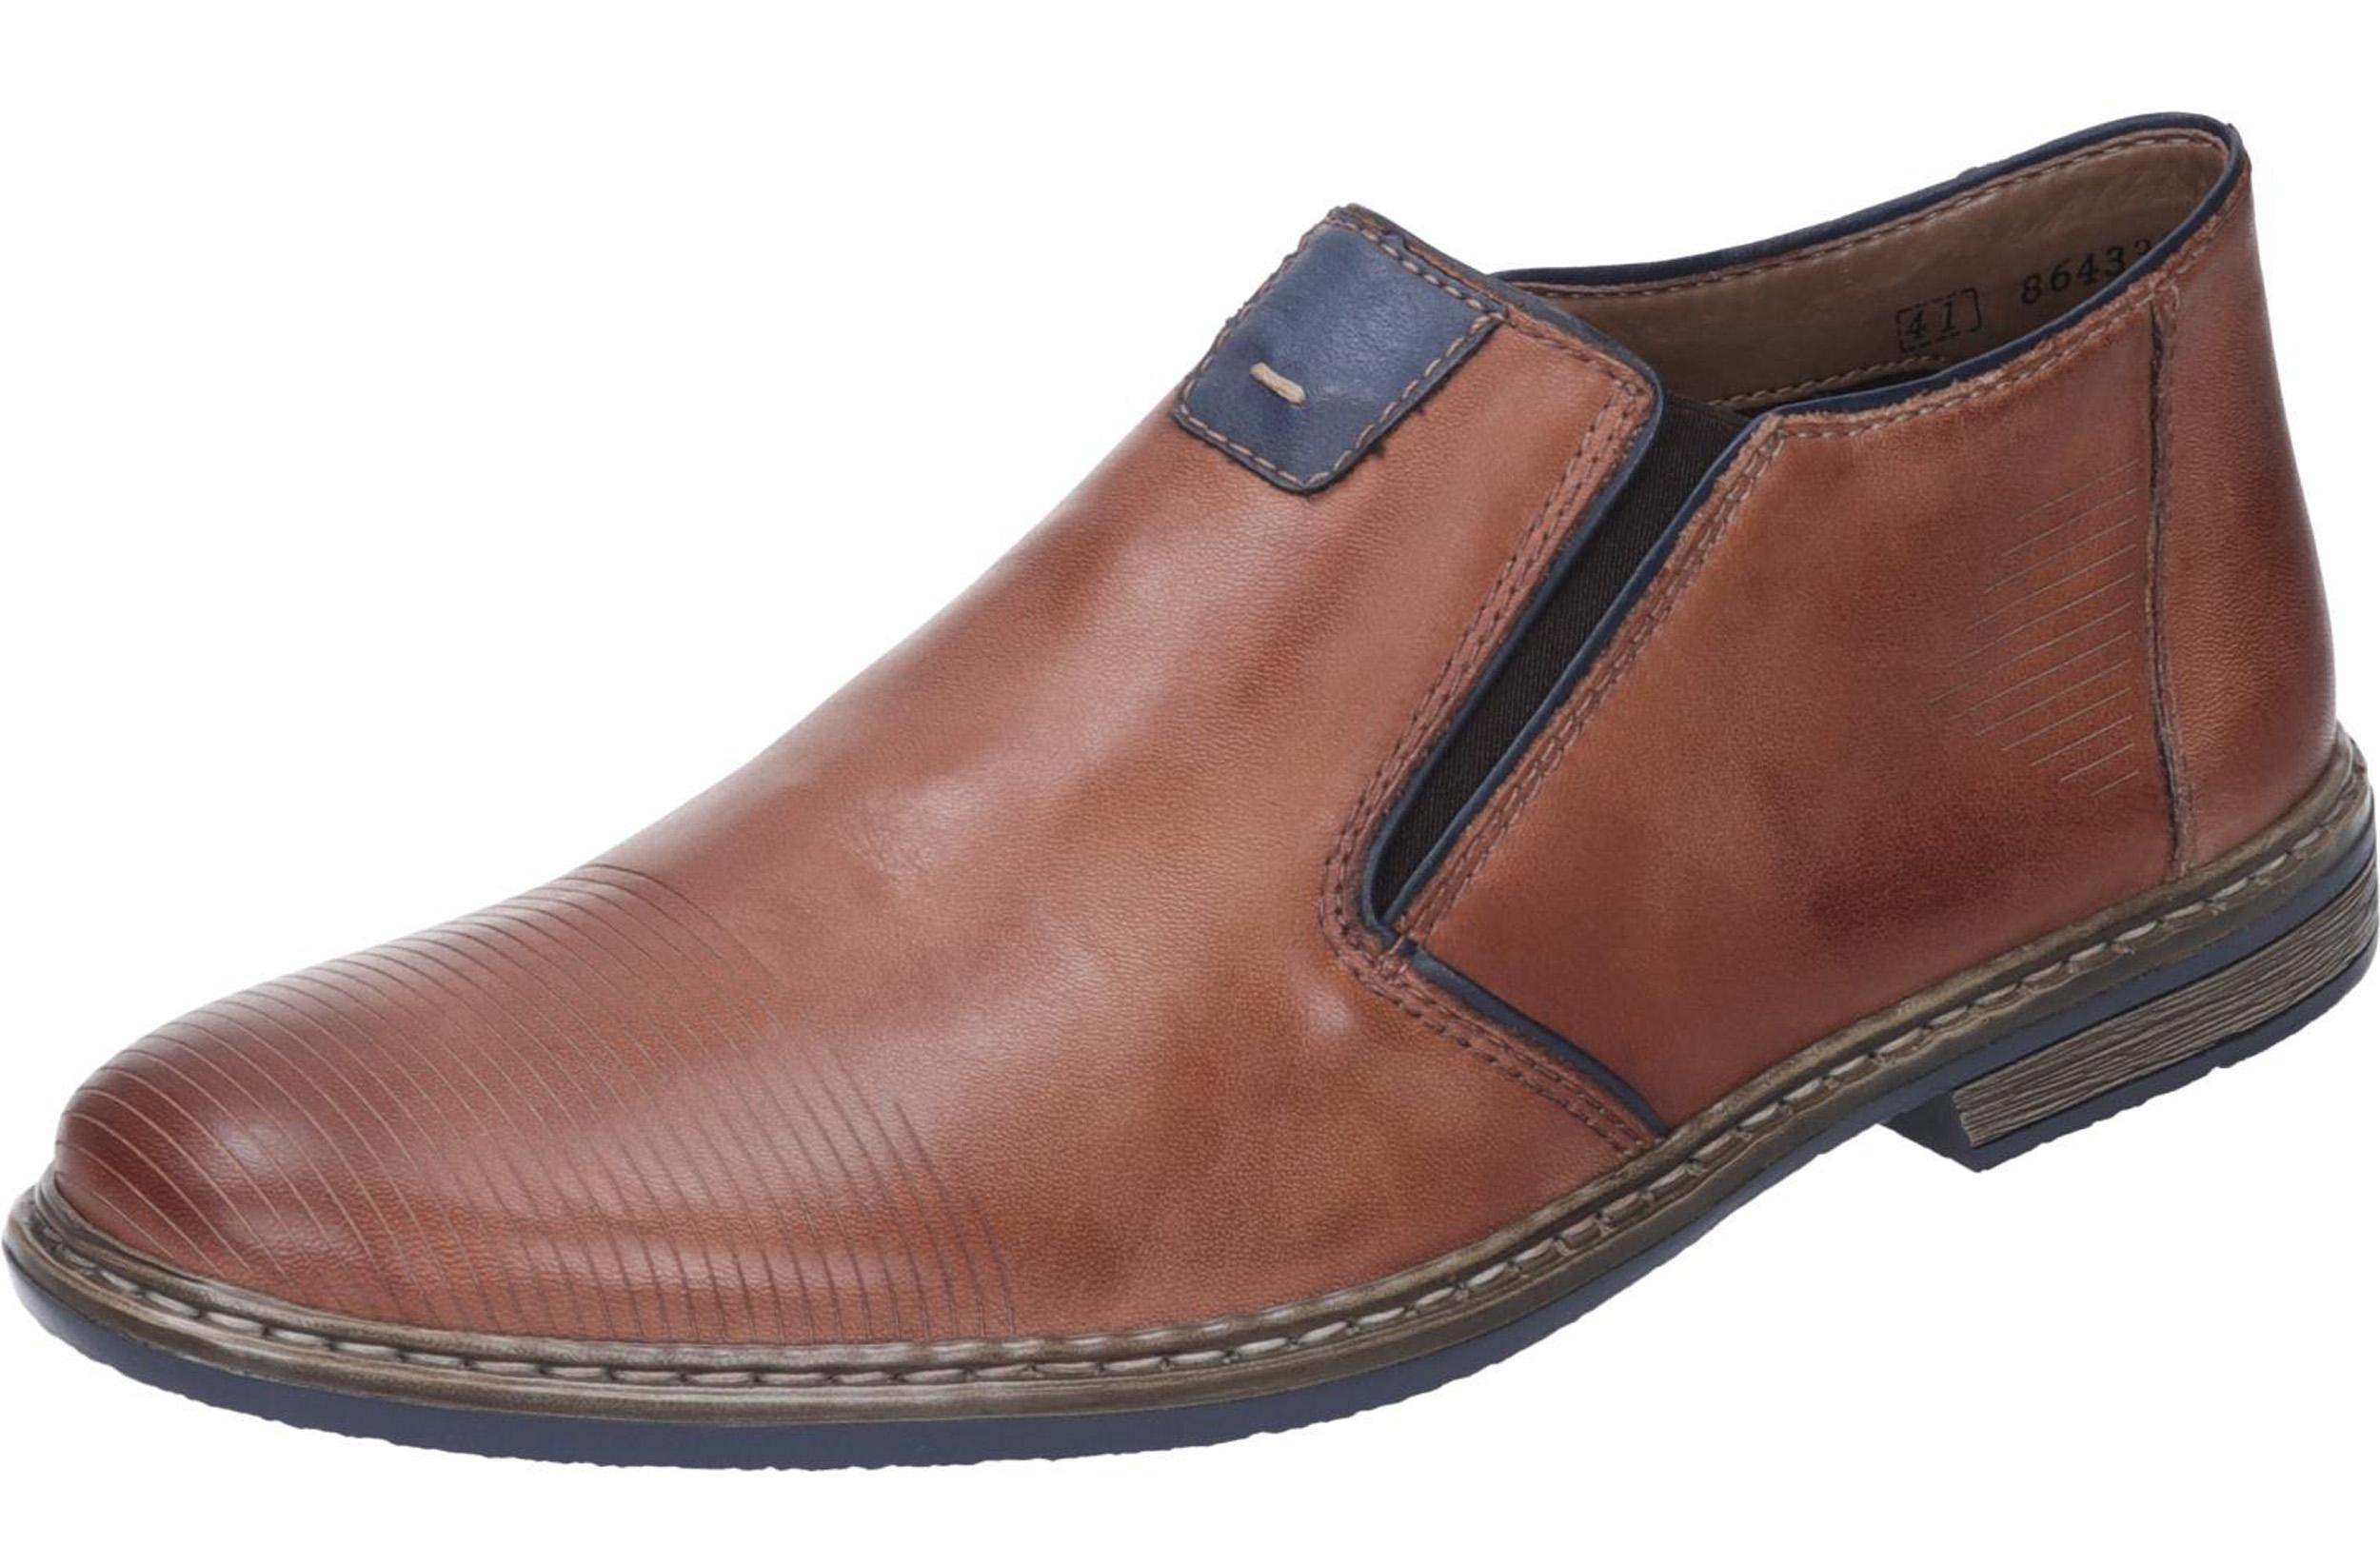 sneakers for cheap 3bf47 049f1 Rieker Herren Slipper Echtleder braun